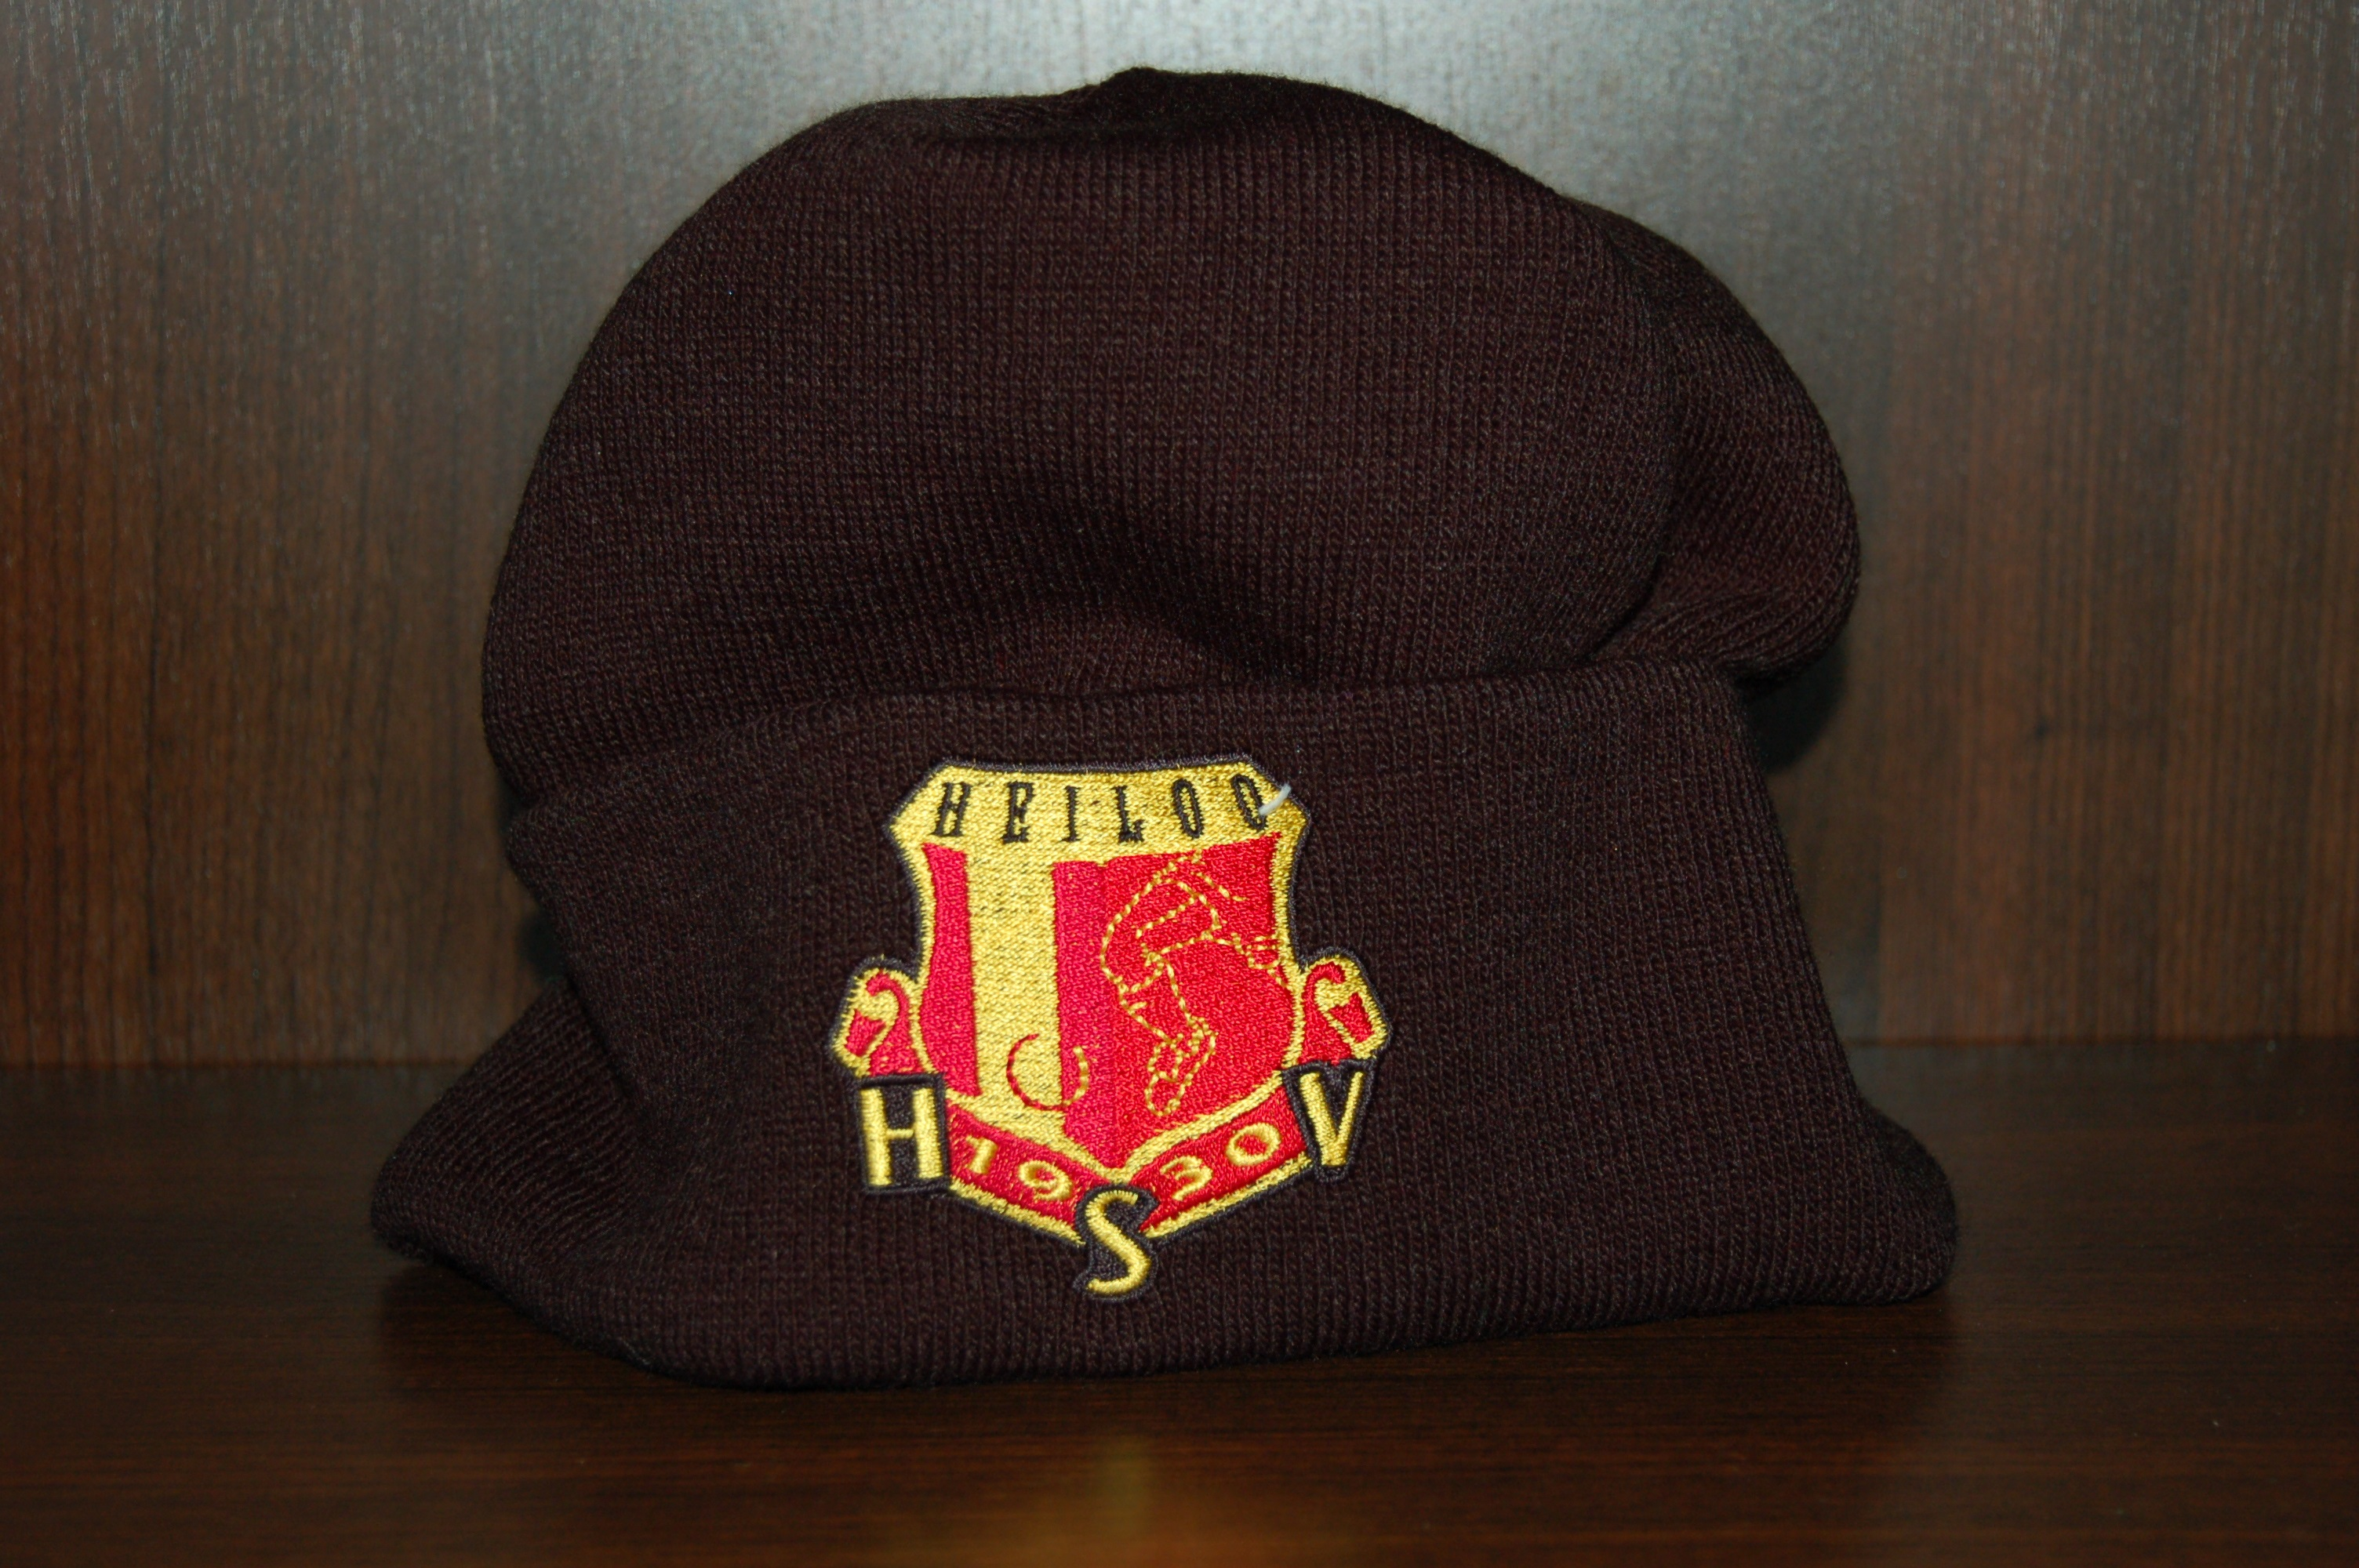 HSV Muts